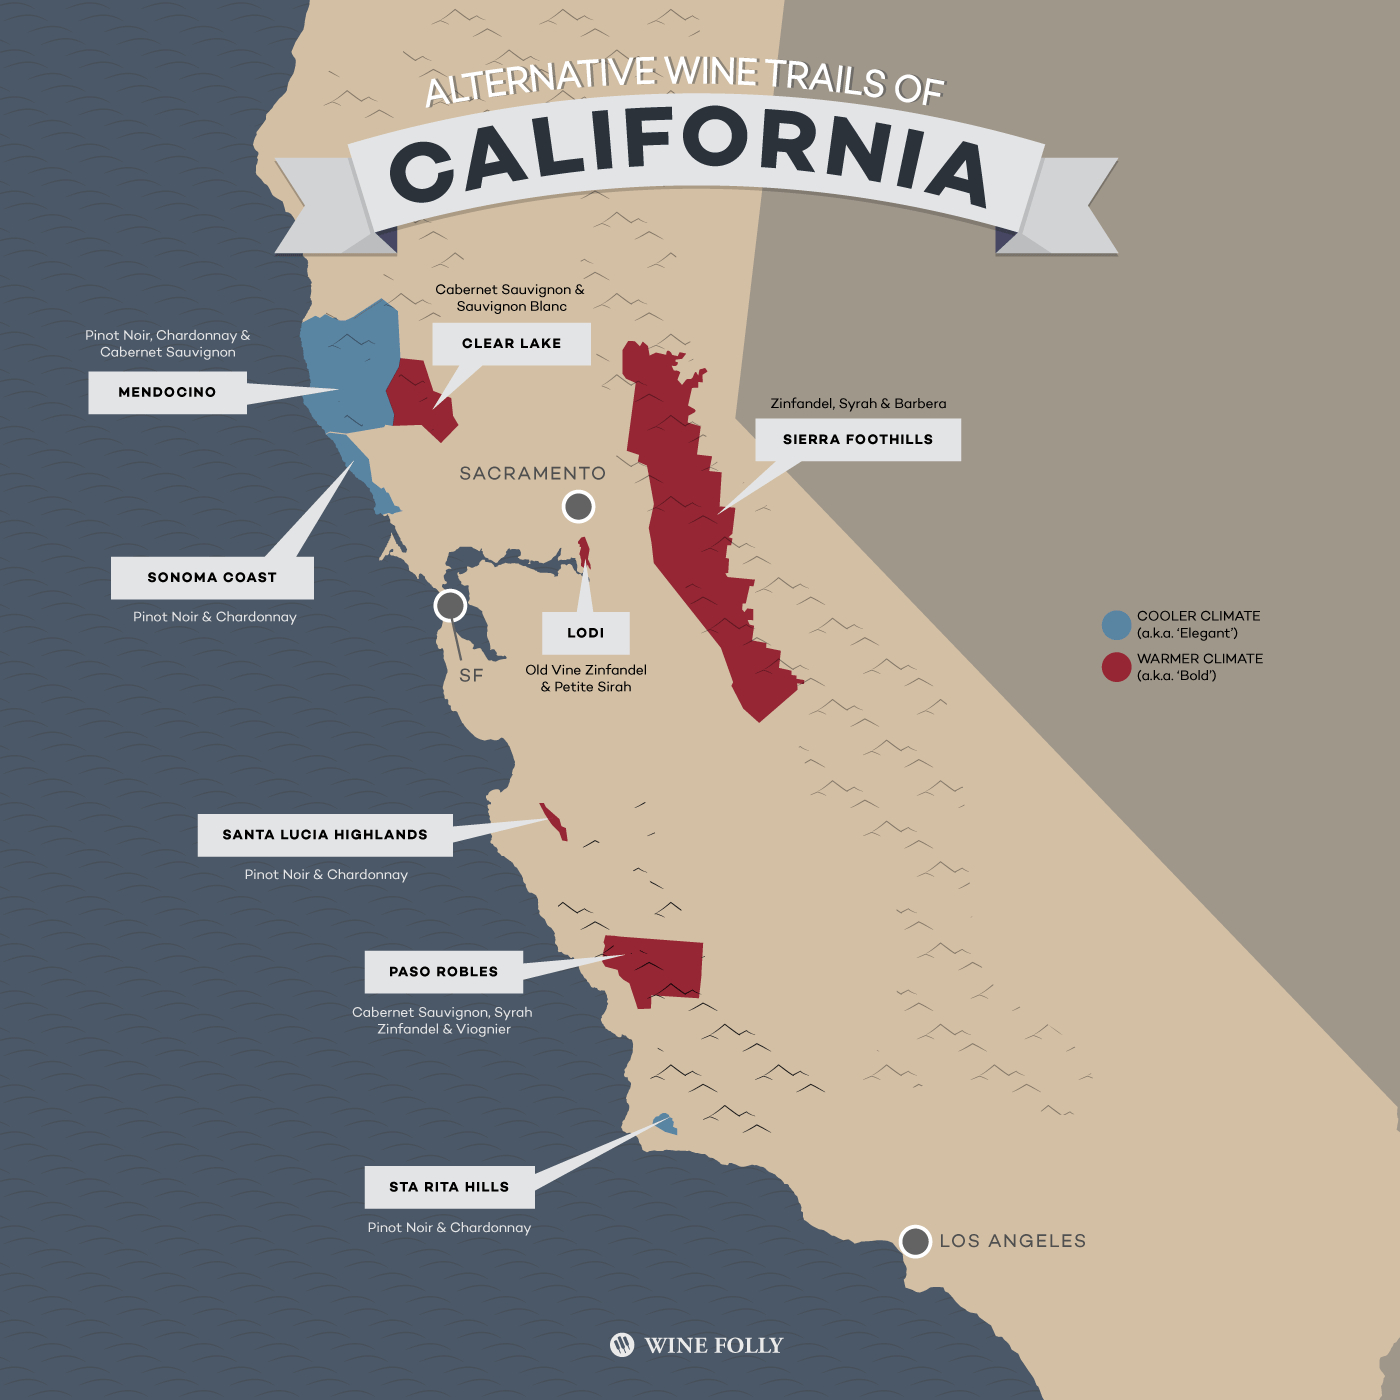 8 Alternative Wine Trails Of California | Wine Folly - California Wine Map